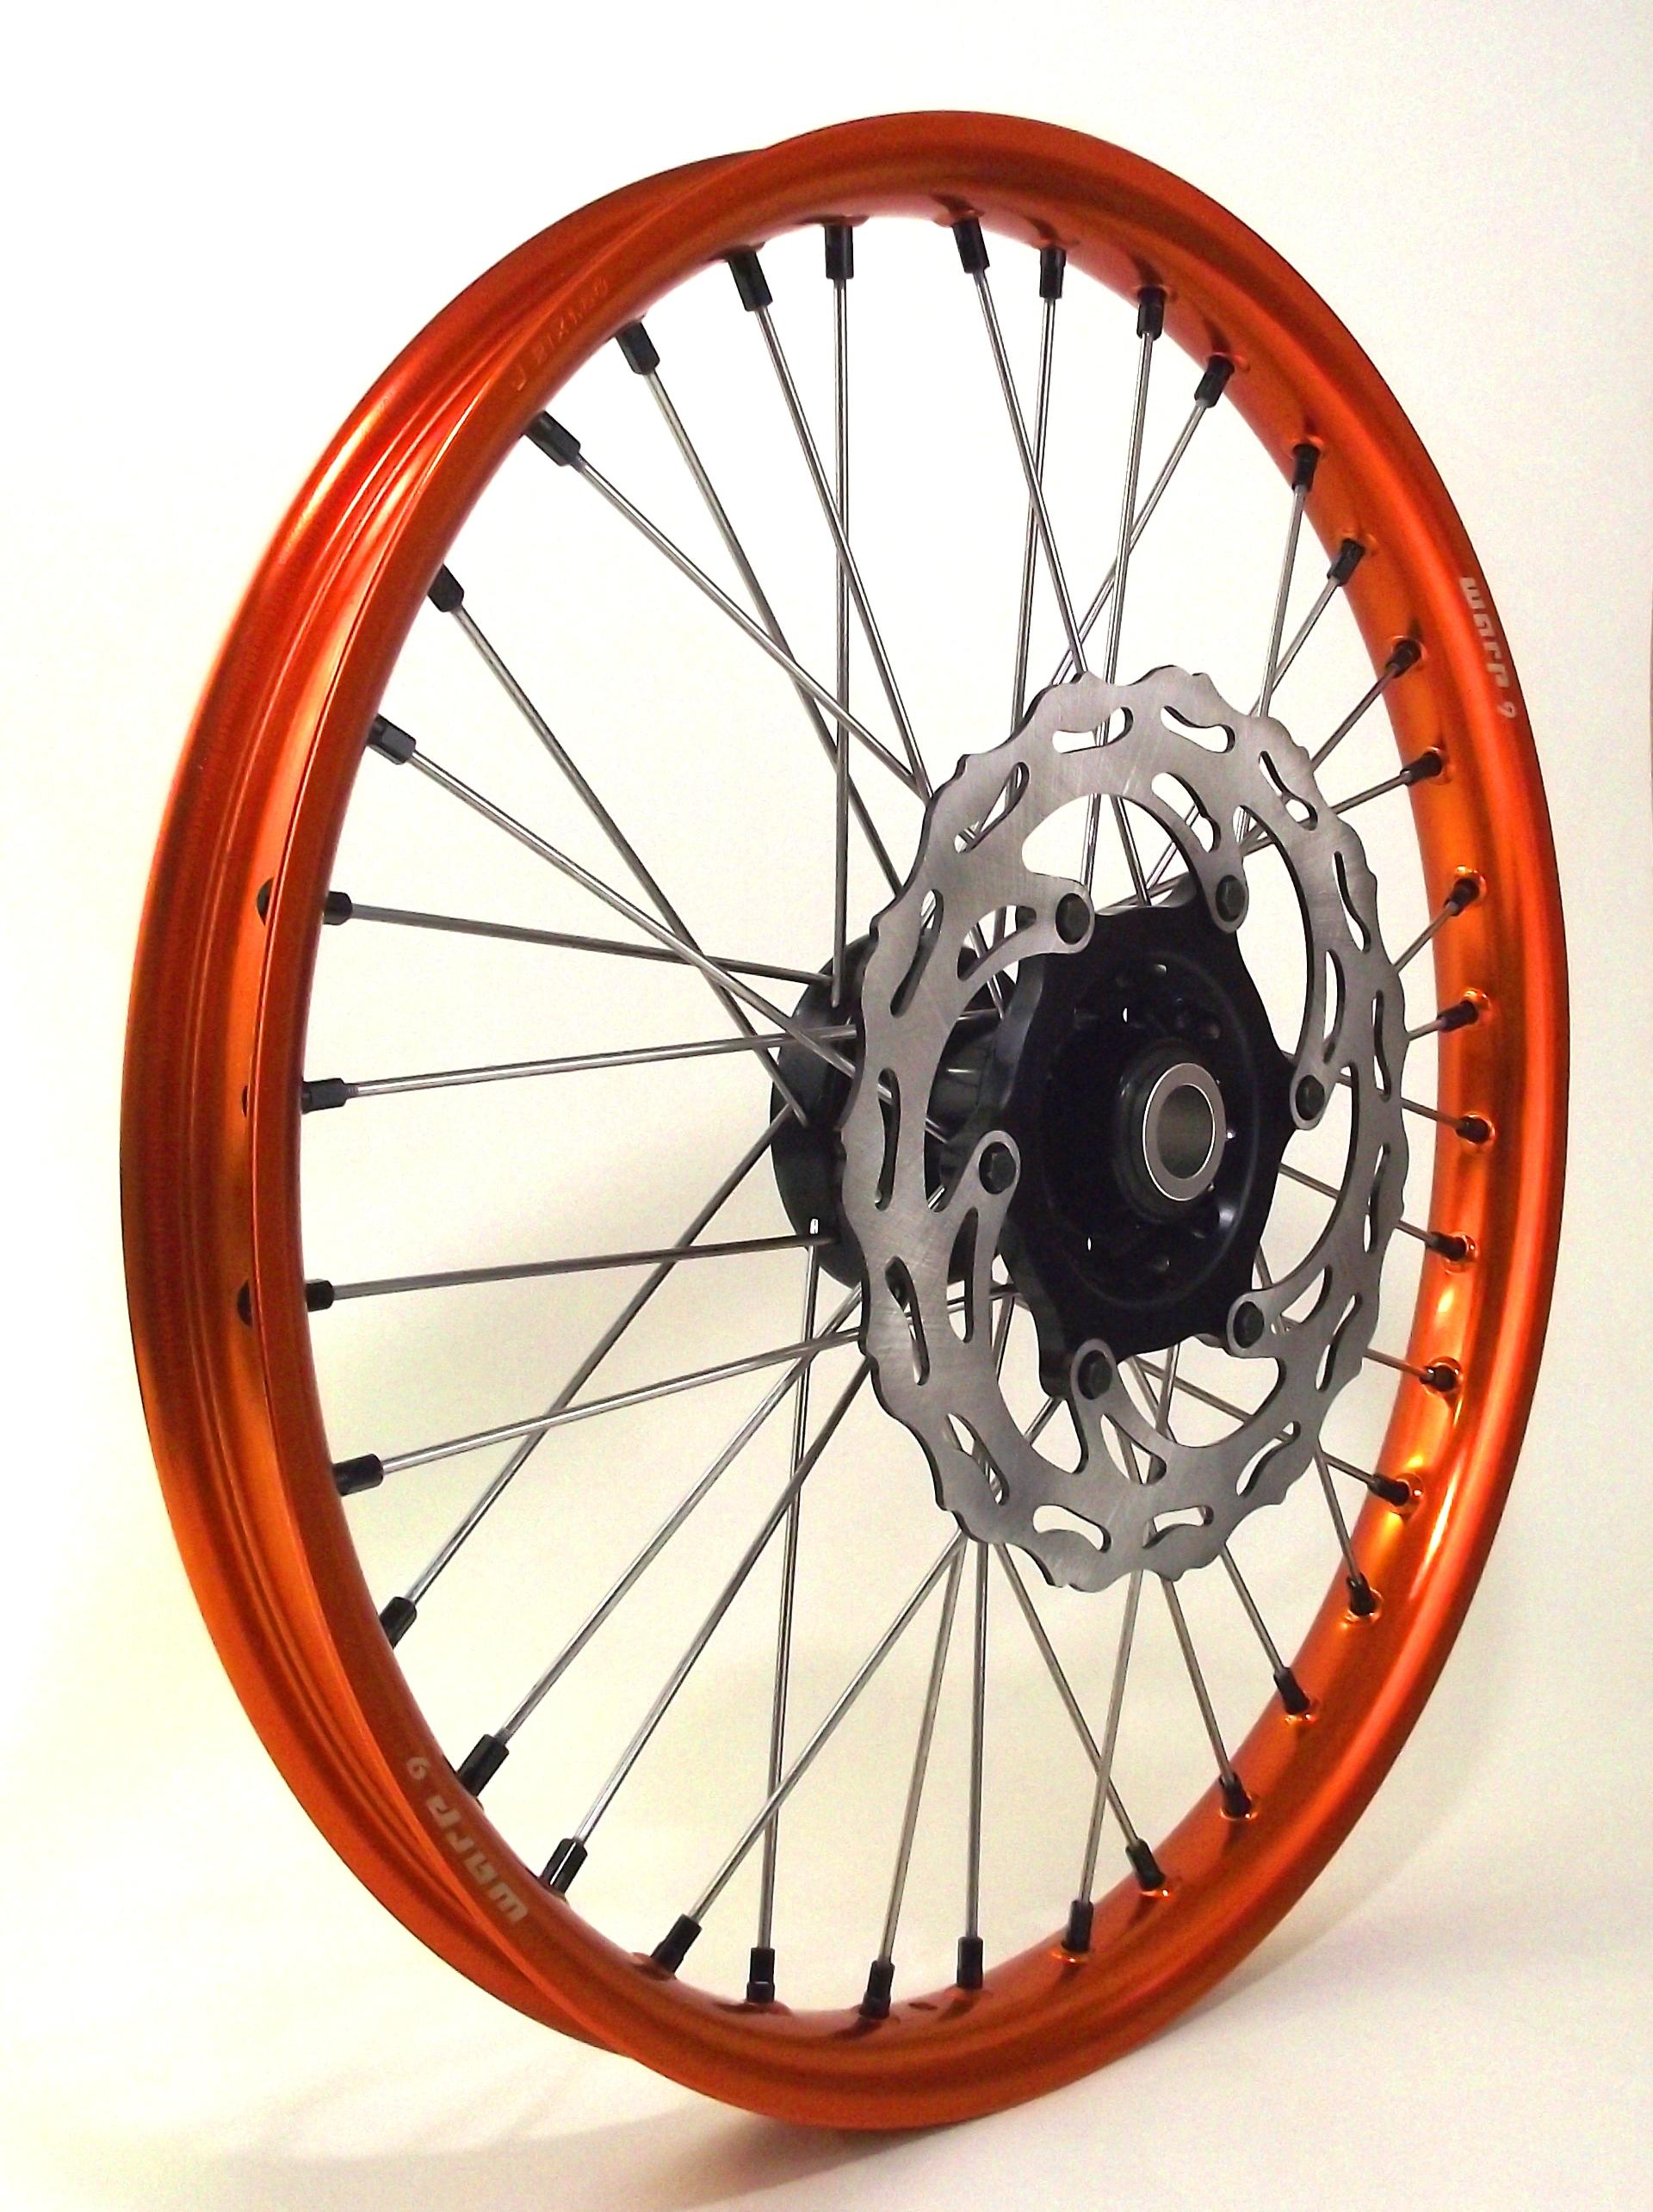 Mx Wheel Set Motocross Wheels Buy Warp 9 Mx Wheel Set